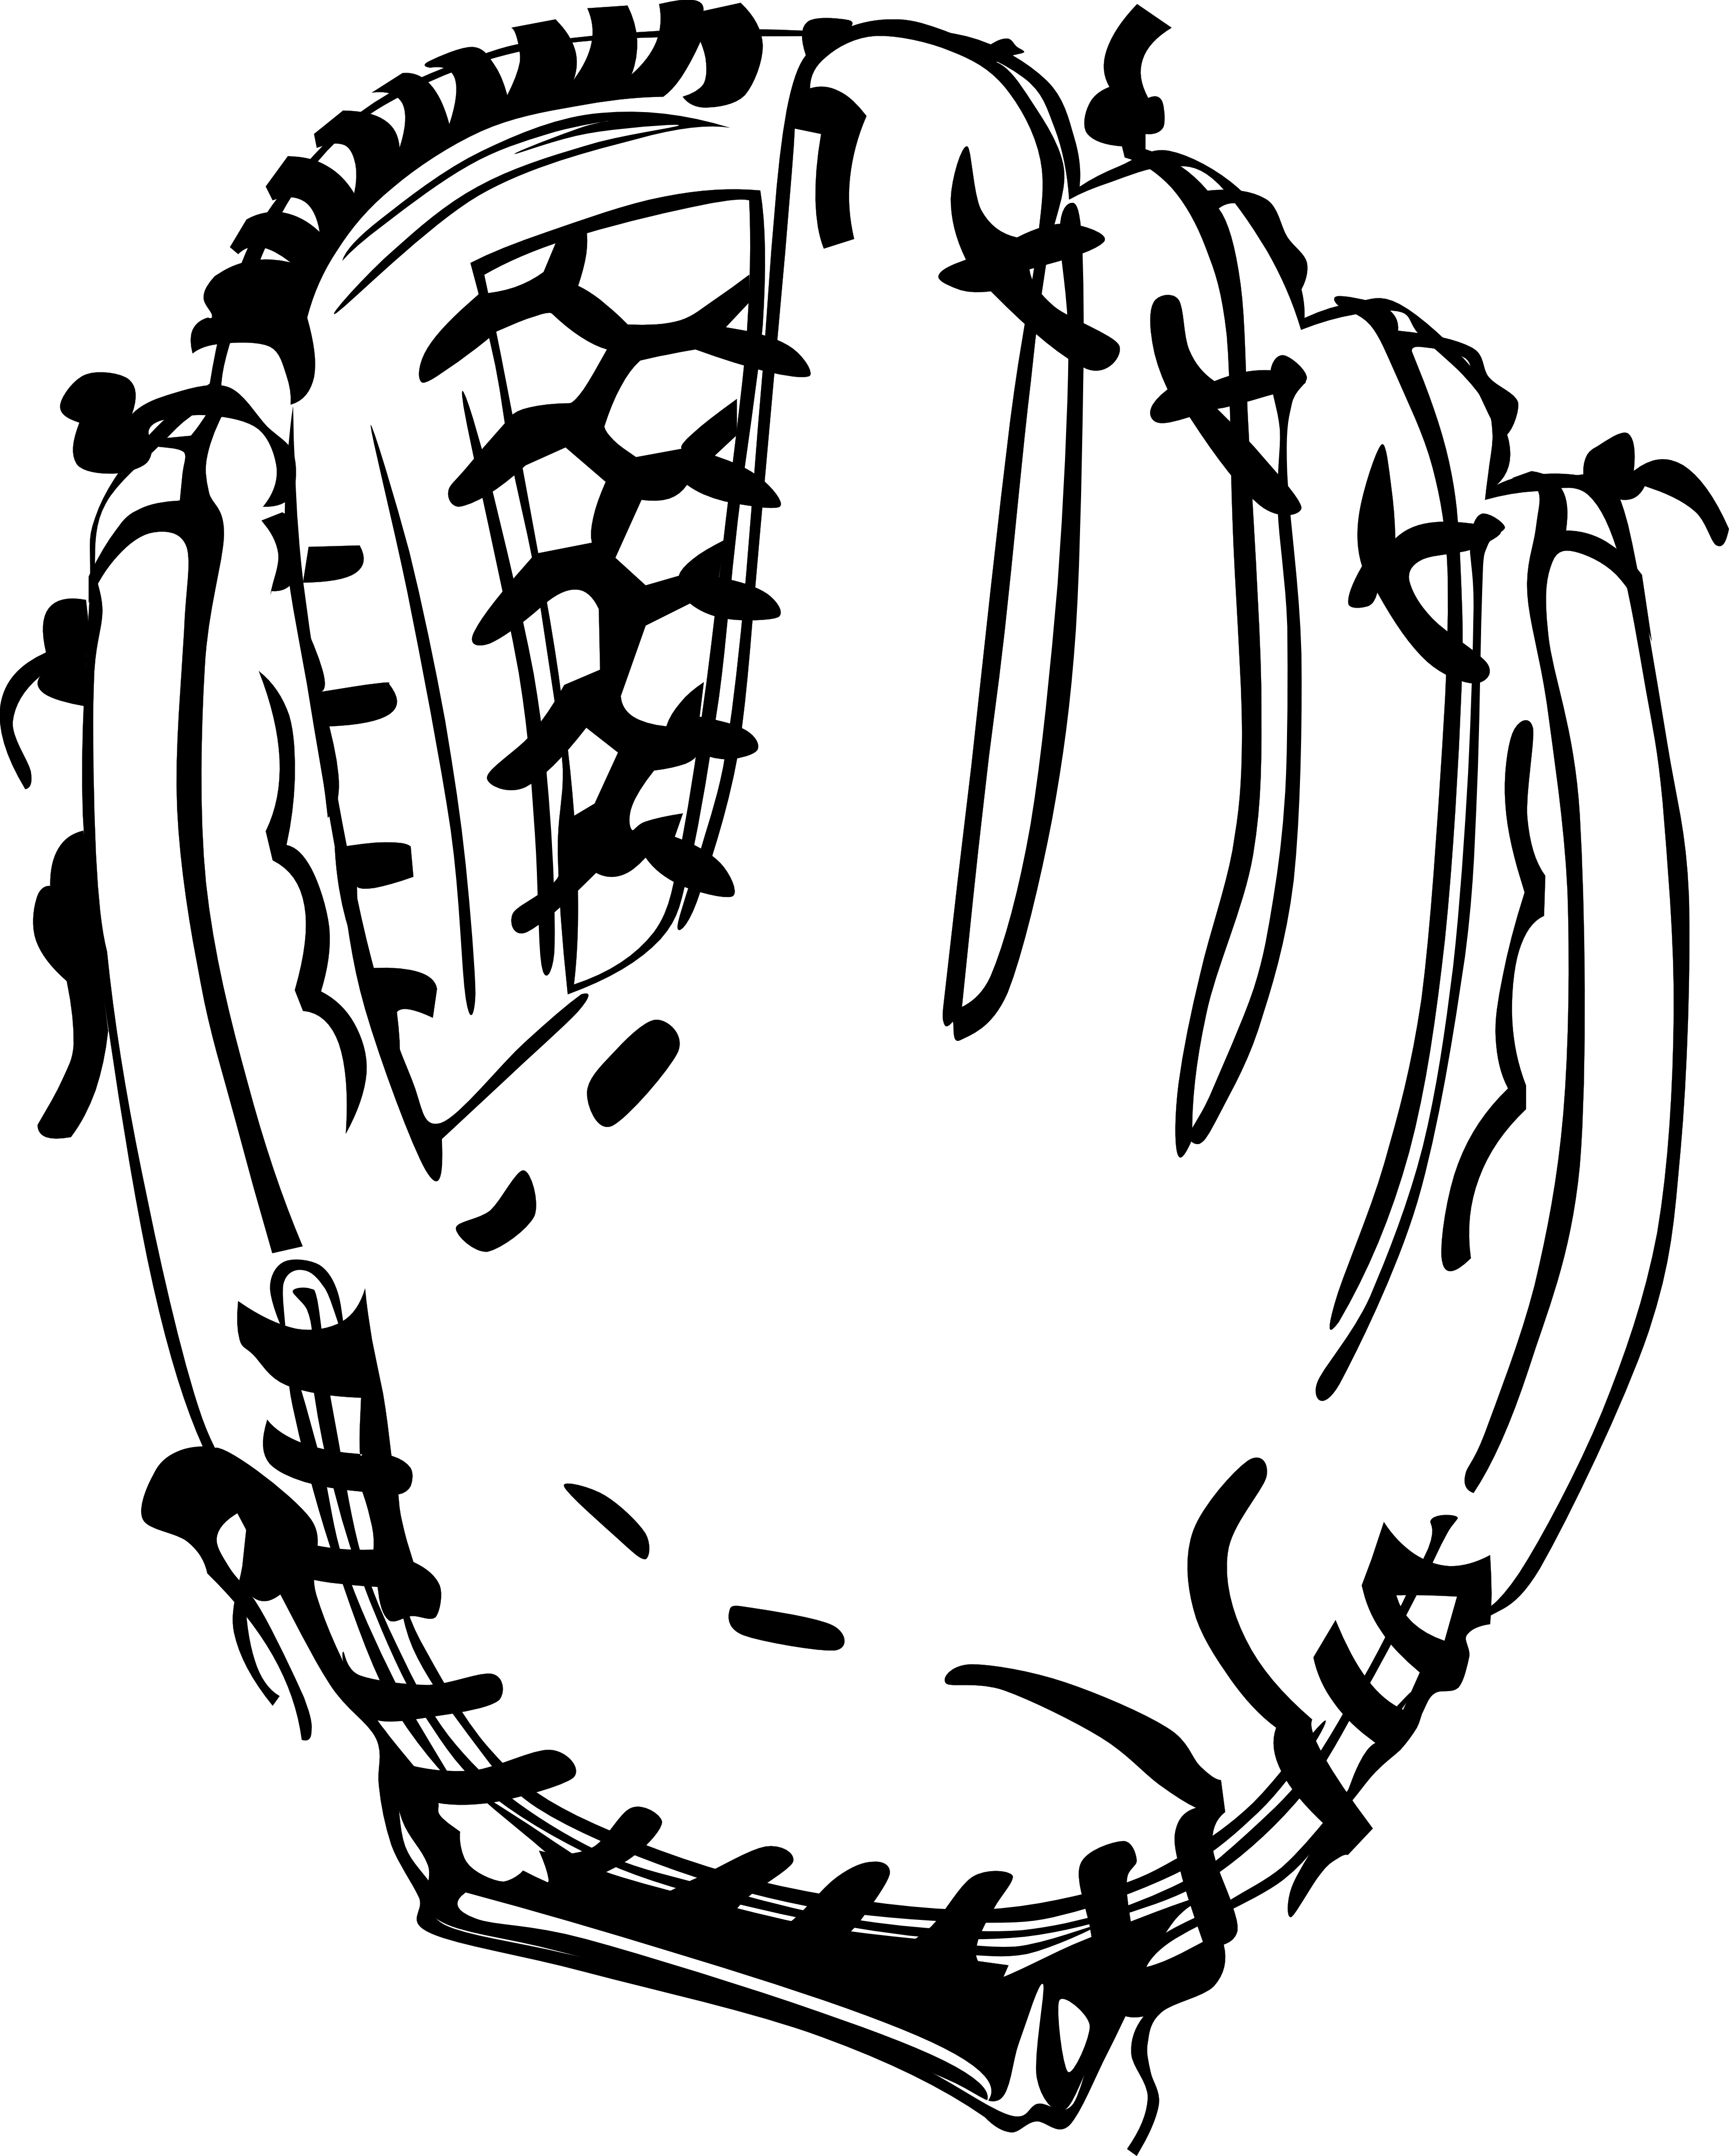 Baseball diamond baseball clipart black and white free clip art images